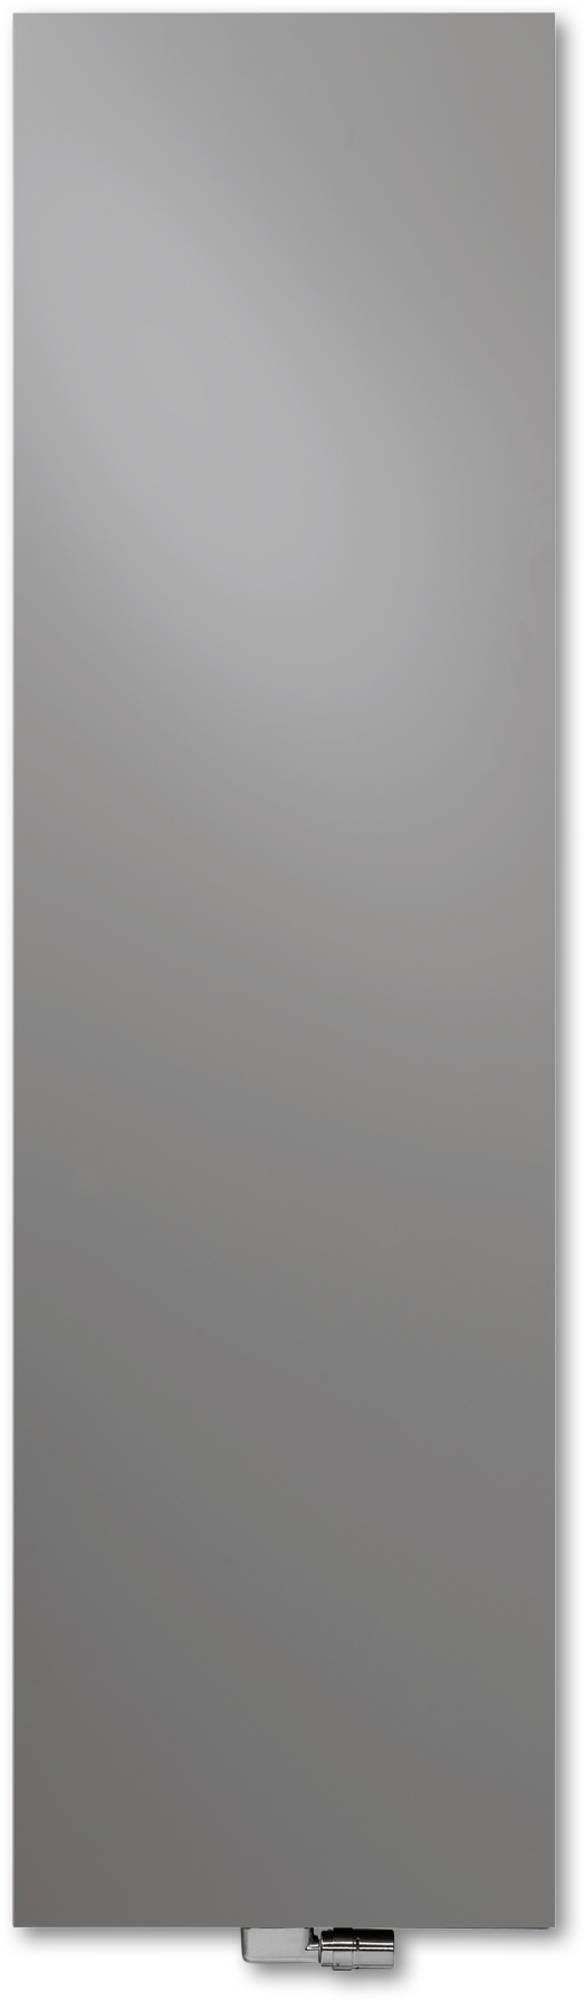 Vasco Niva Verticaal N1L1 Designradiator 182x62 cm Donker Bruin